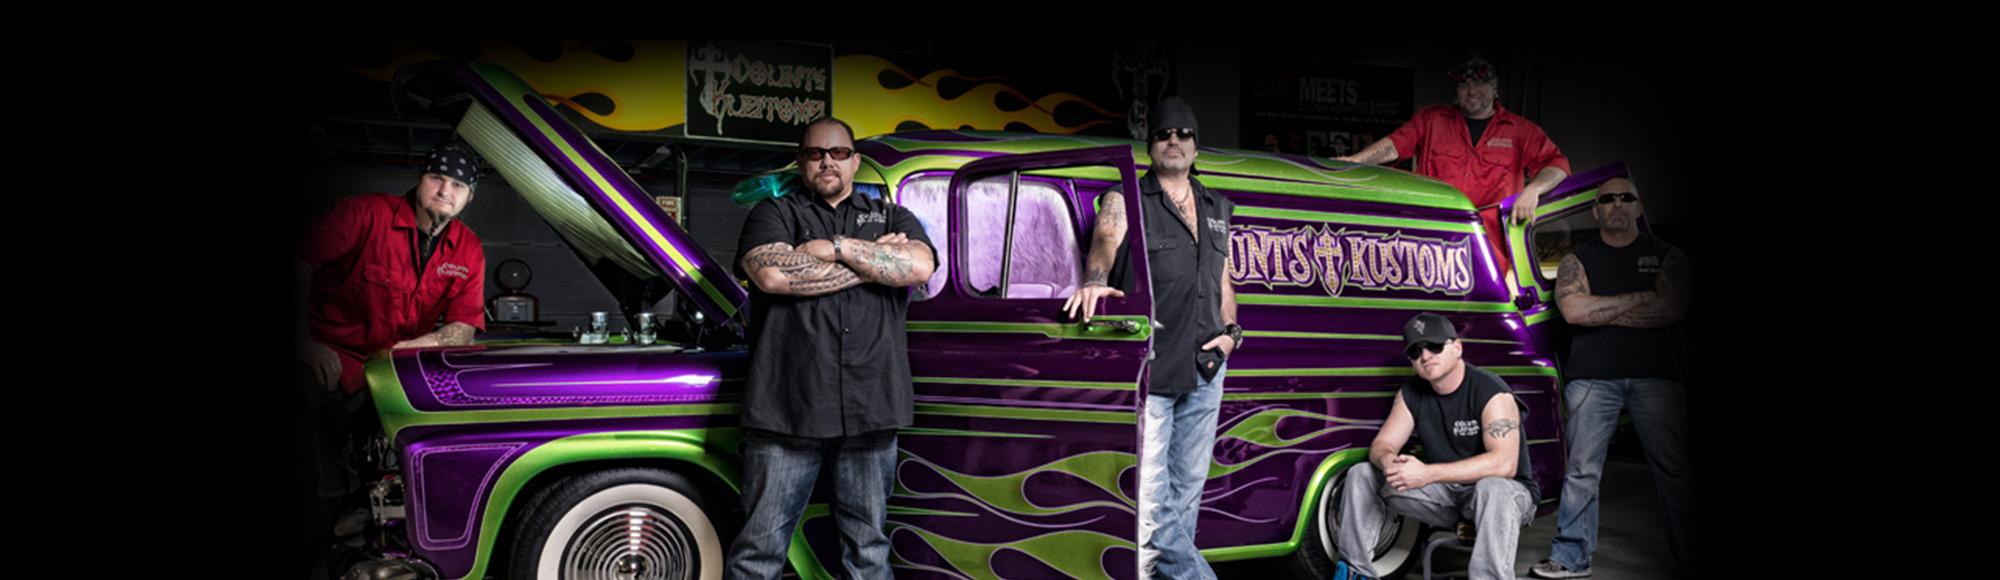 Count's Kustoms Car Tour tour